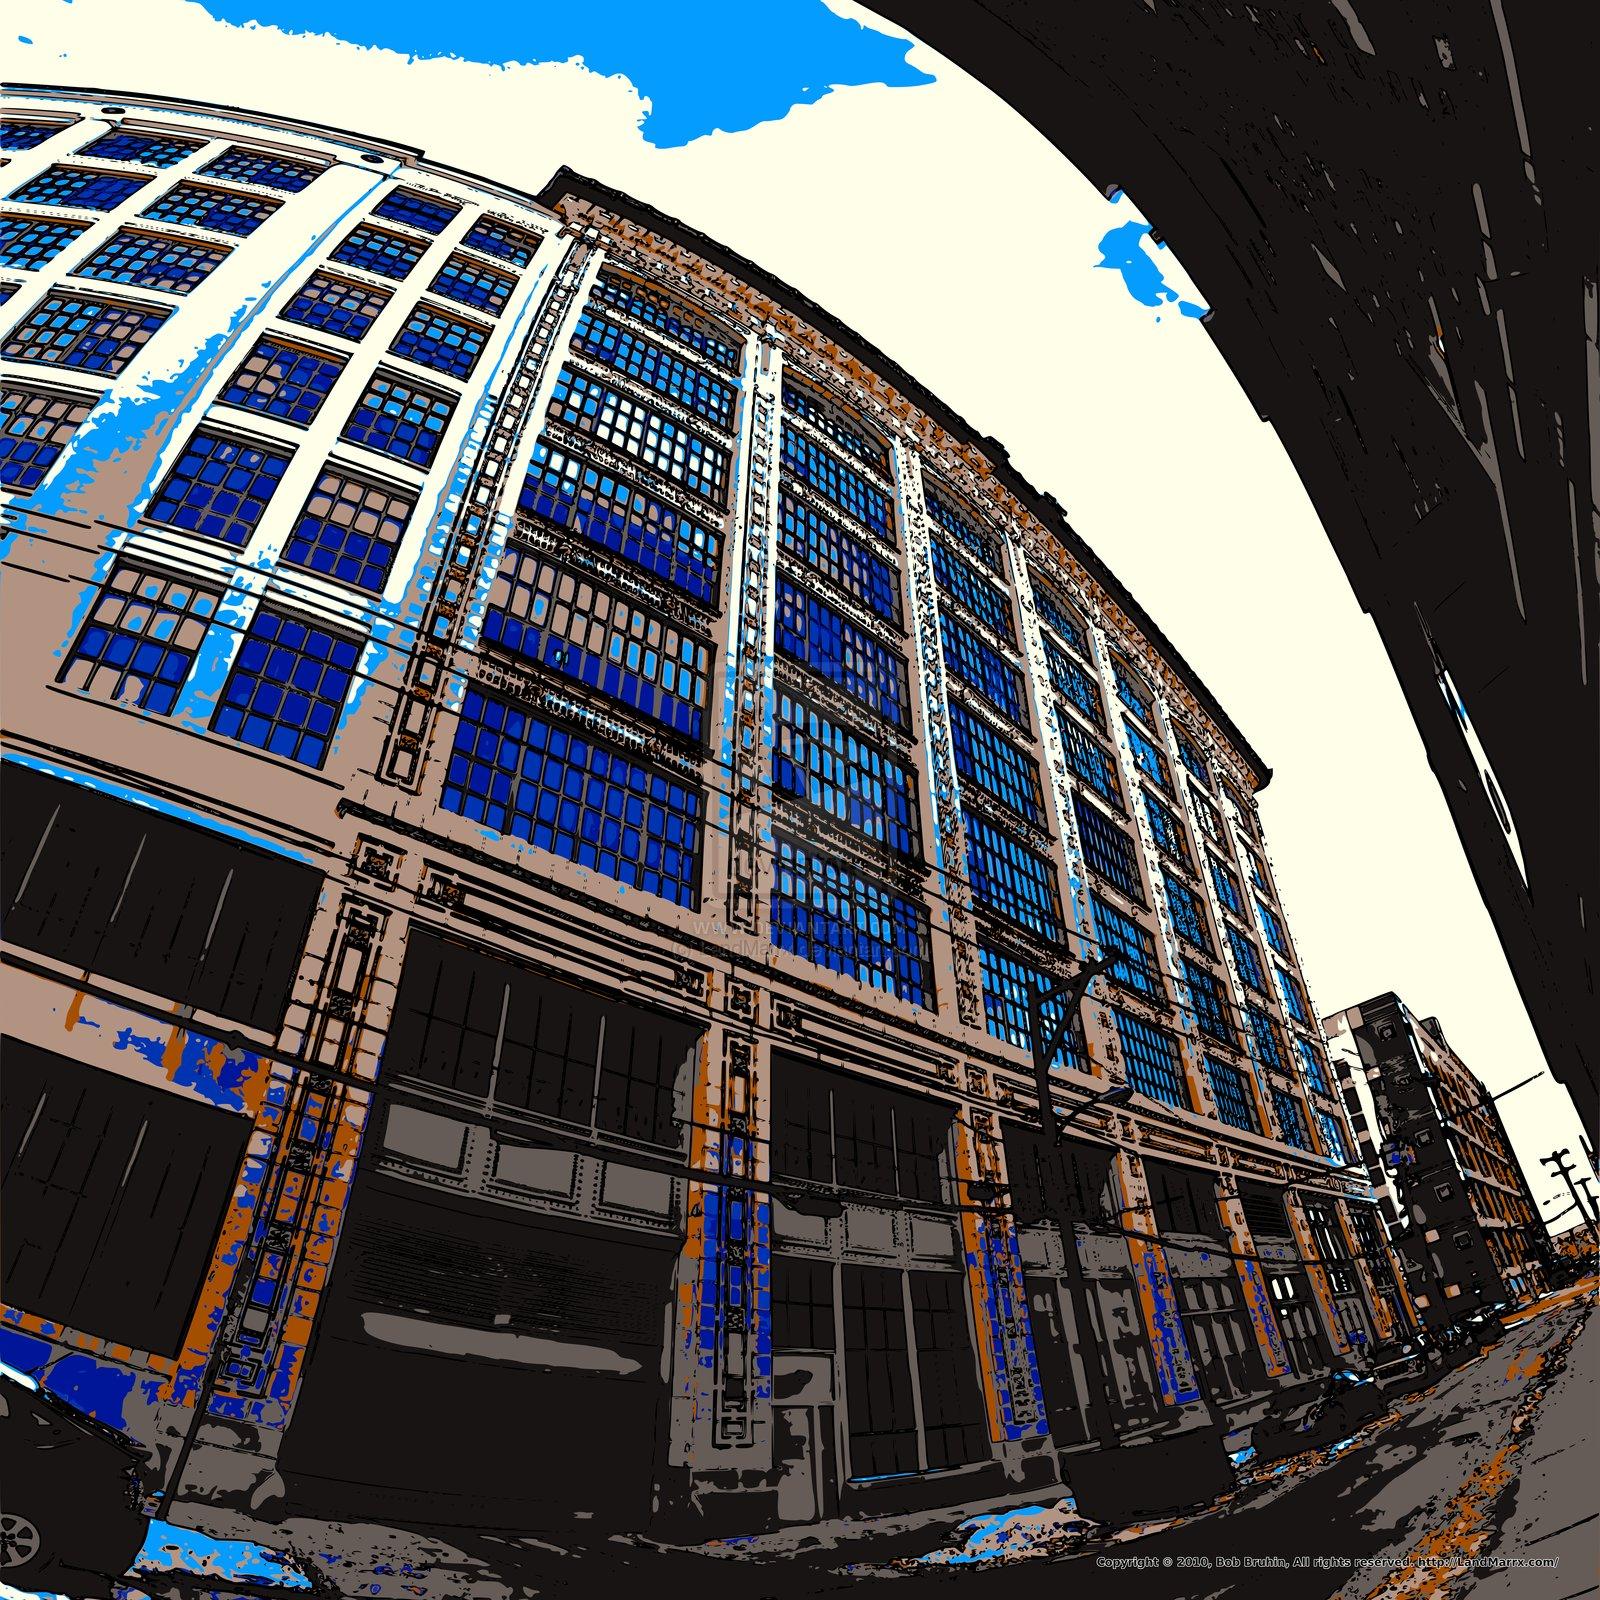 Alley Twist by LandMarrx on deviantART